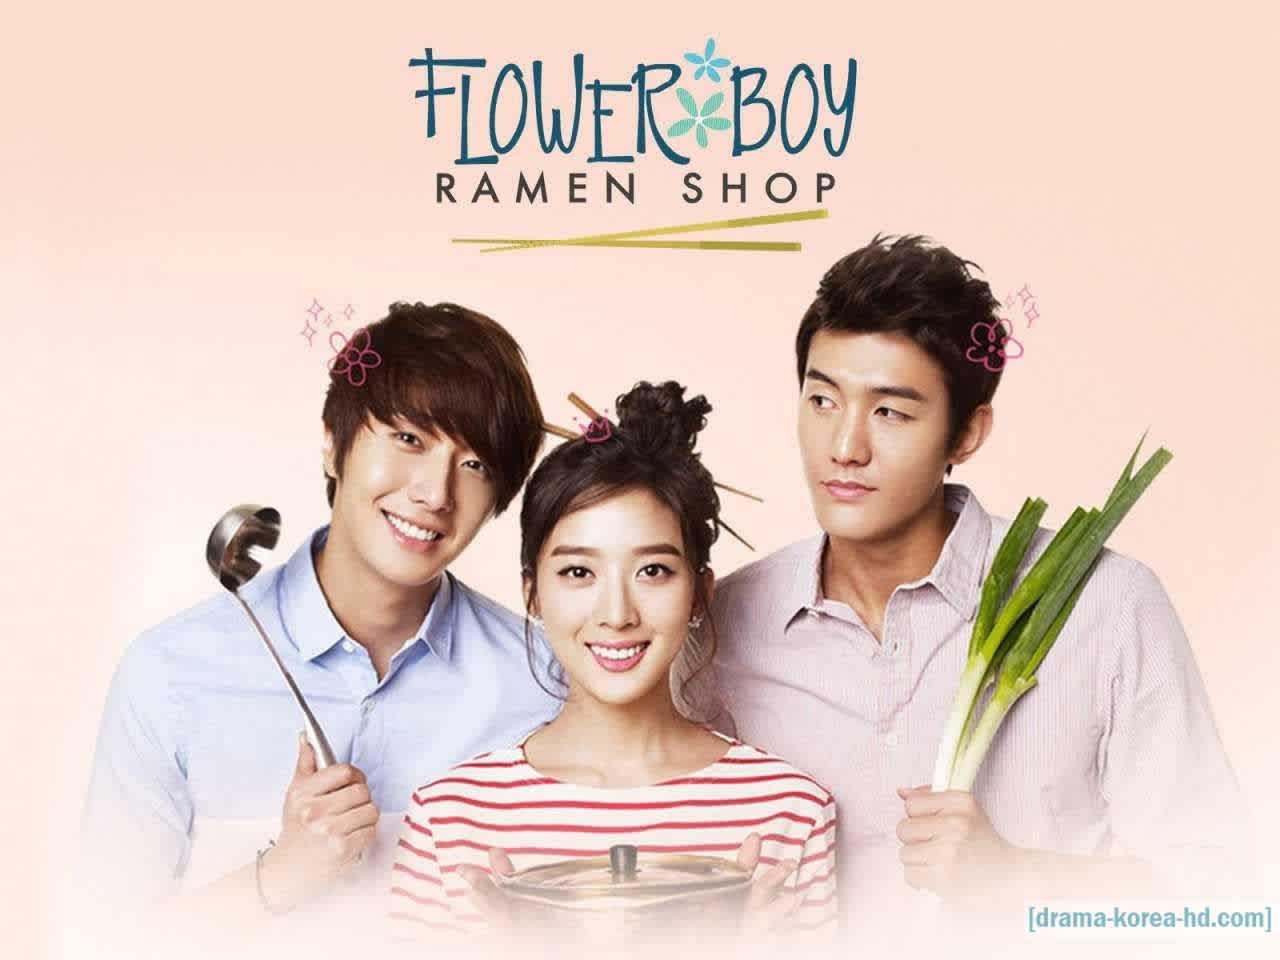 Flower Boy Ramen Shop drama korea